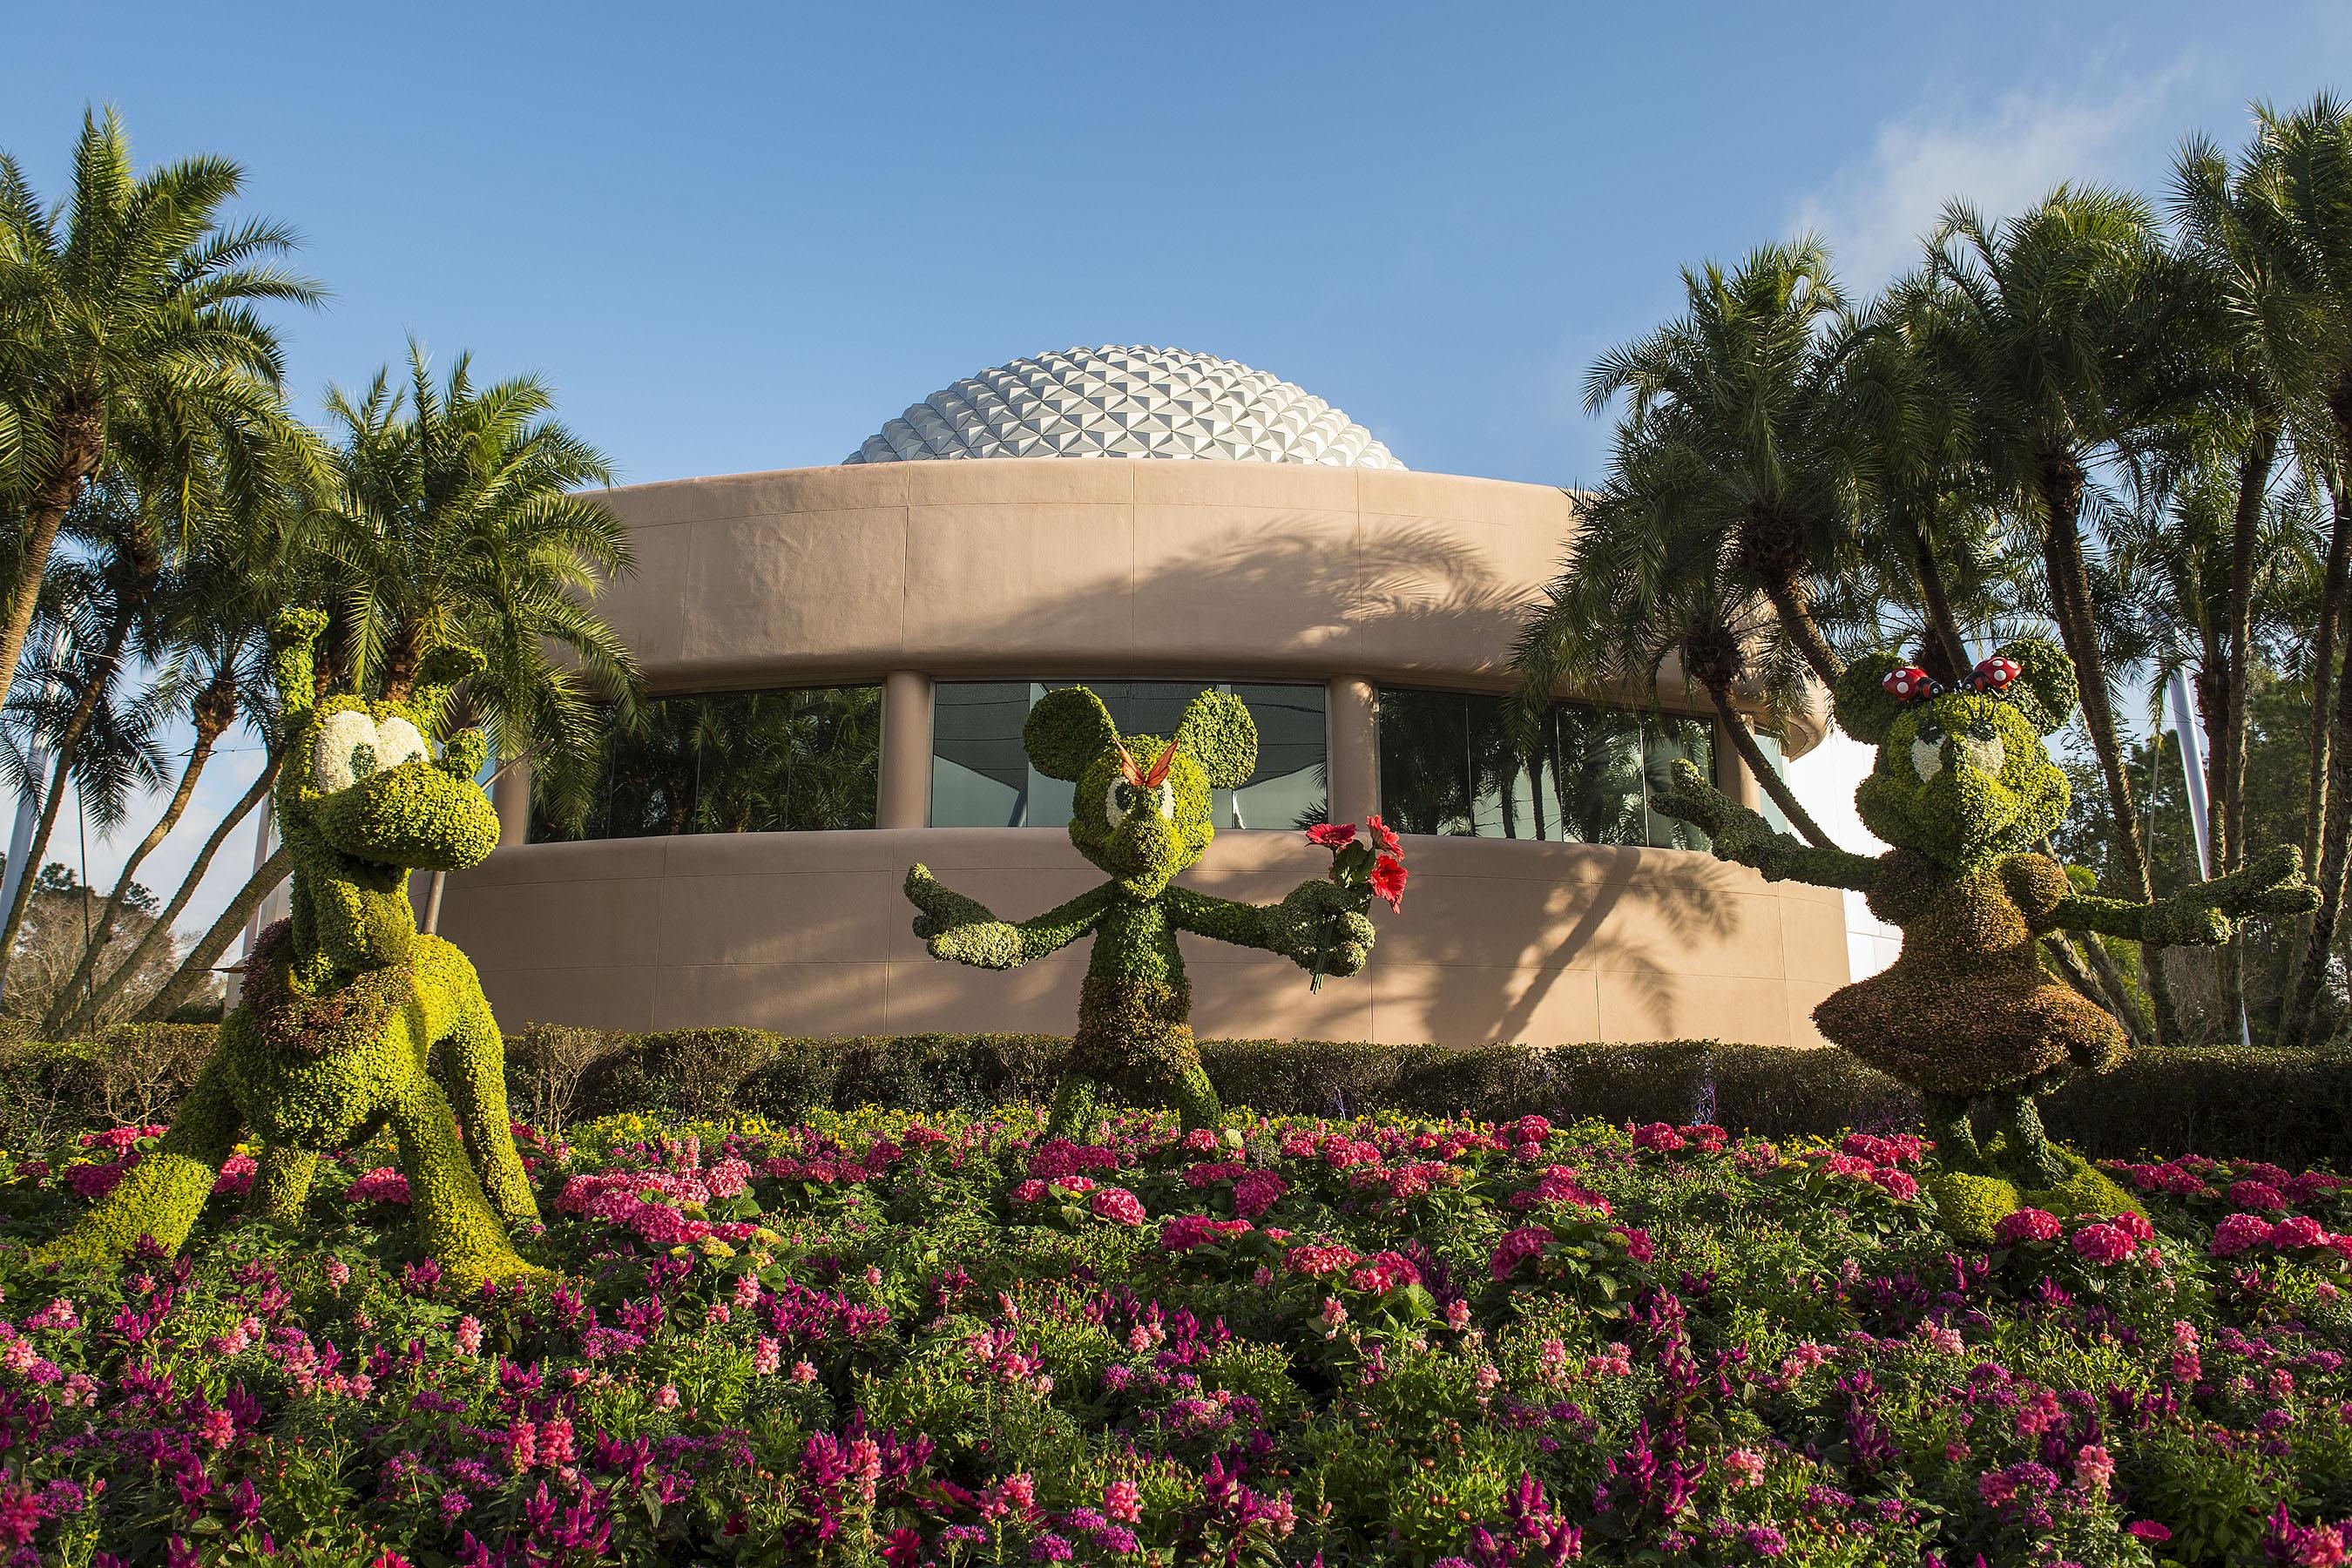 Epcot Garden Rocks Concert Series Bands Announced Disney World Enthusiast